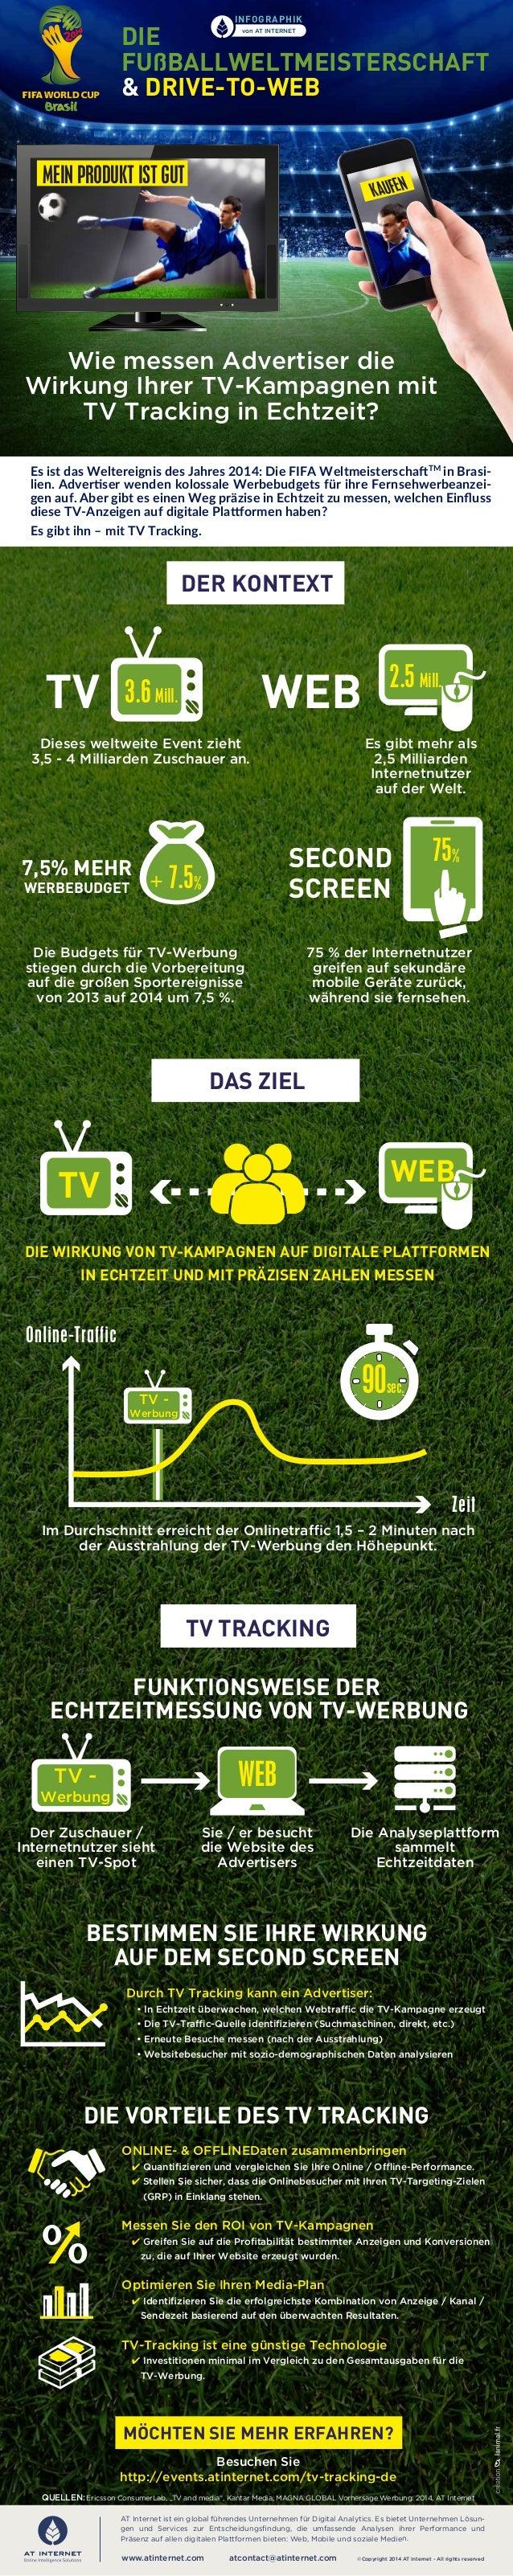 www.atinternet.com atcontact@atinternet.com MEIN PRODUKT IST GUT KAUFEN I I III I II I II I 75% WEB 90sec. TV WEB TV - Wer...